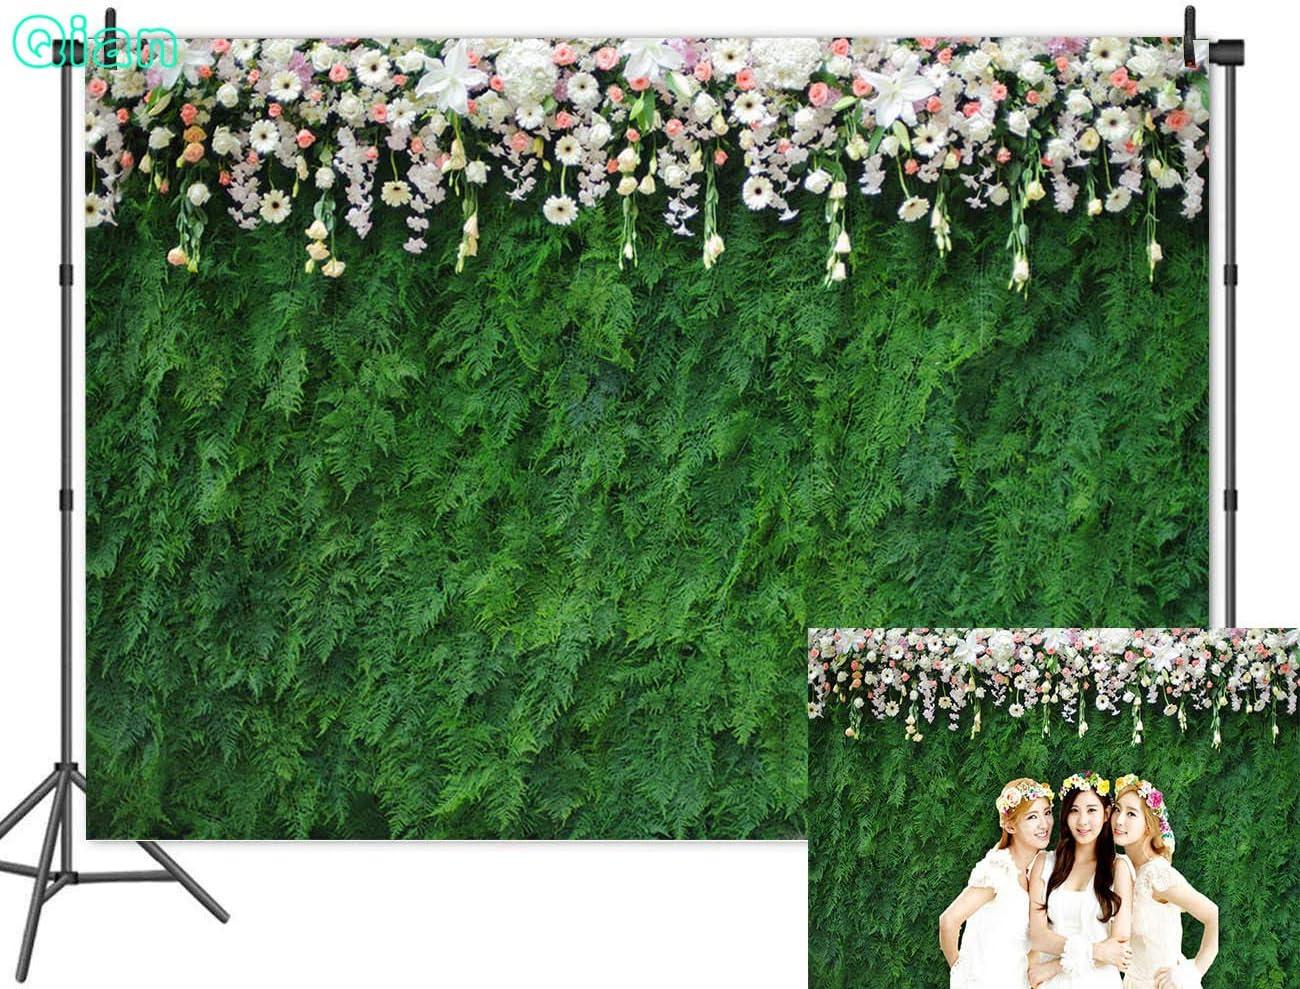 Qian Vinyl 9x6ft Nature Green Leaf Photography Backdrops 3D Floral Photo Backdrops for Wedding Bridal Shower Decoration Studio Props Banner